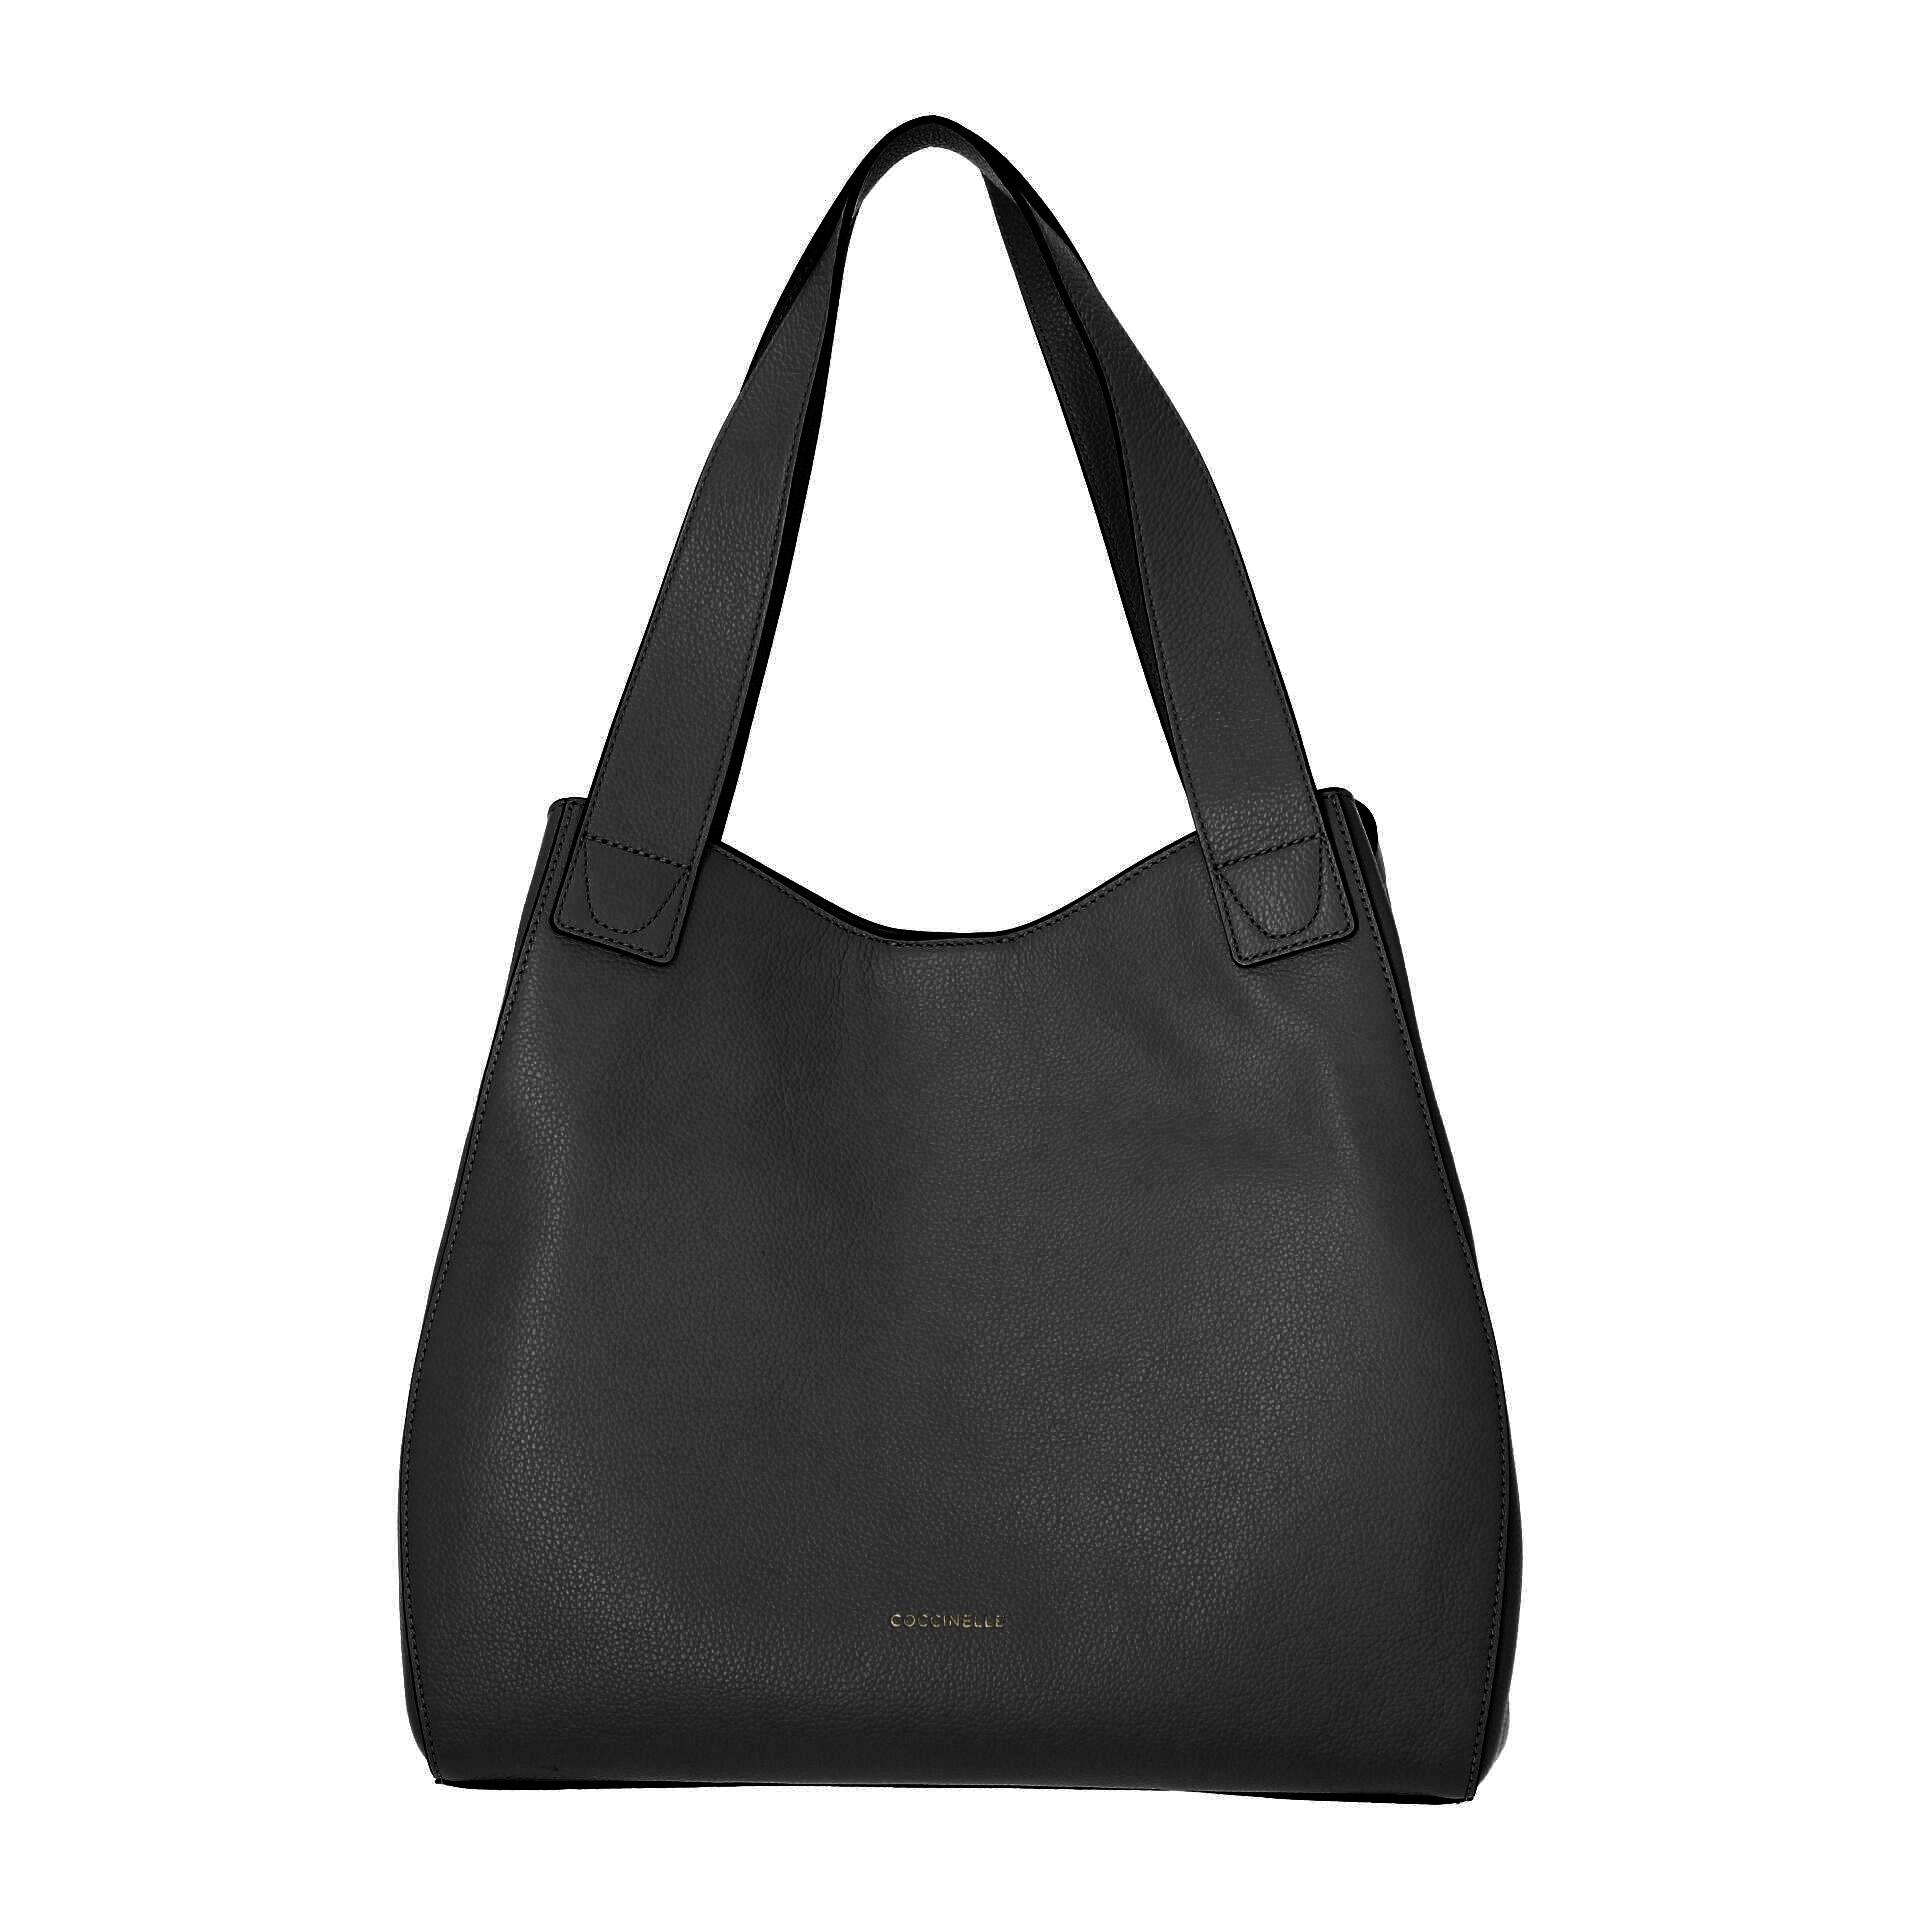 Coccinelle Concrete Journal Handtasche noir